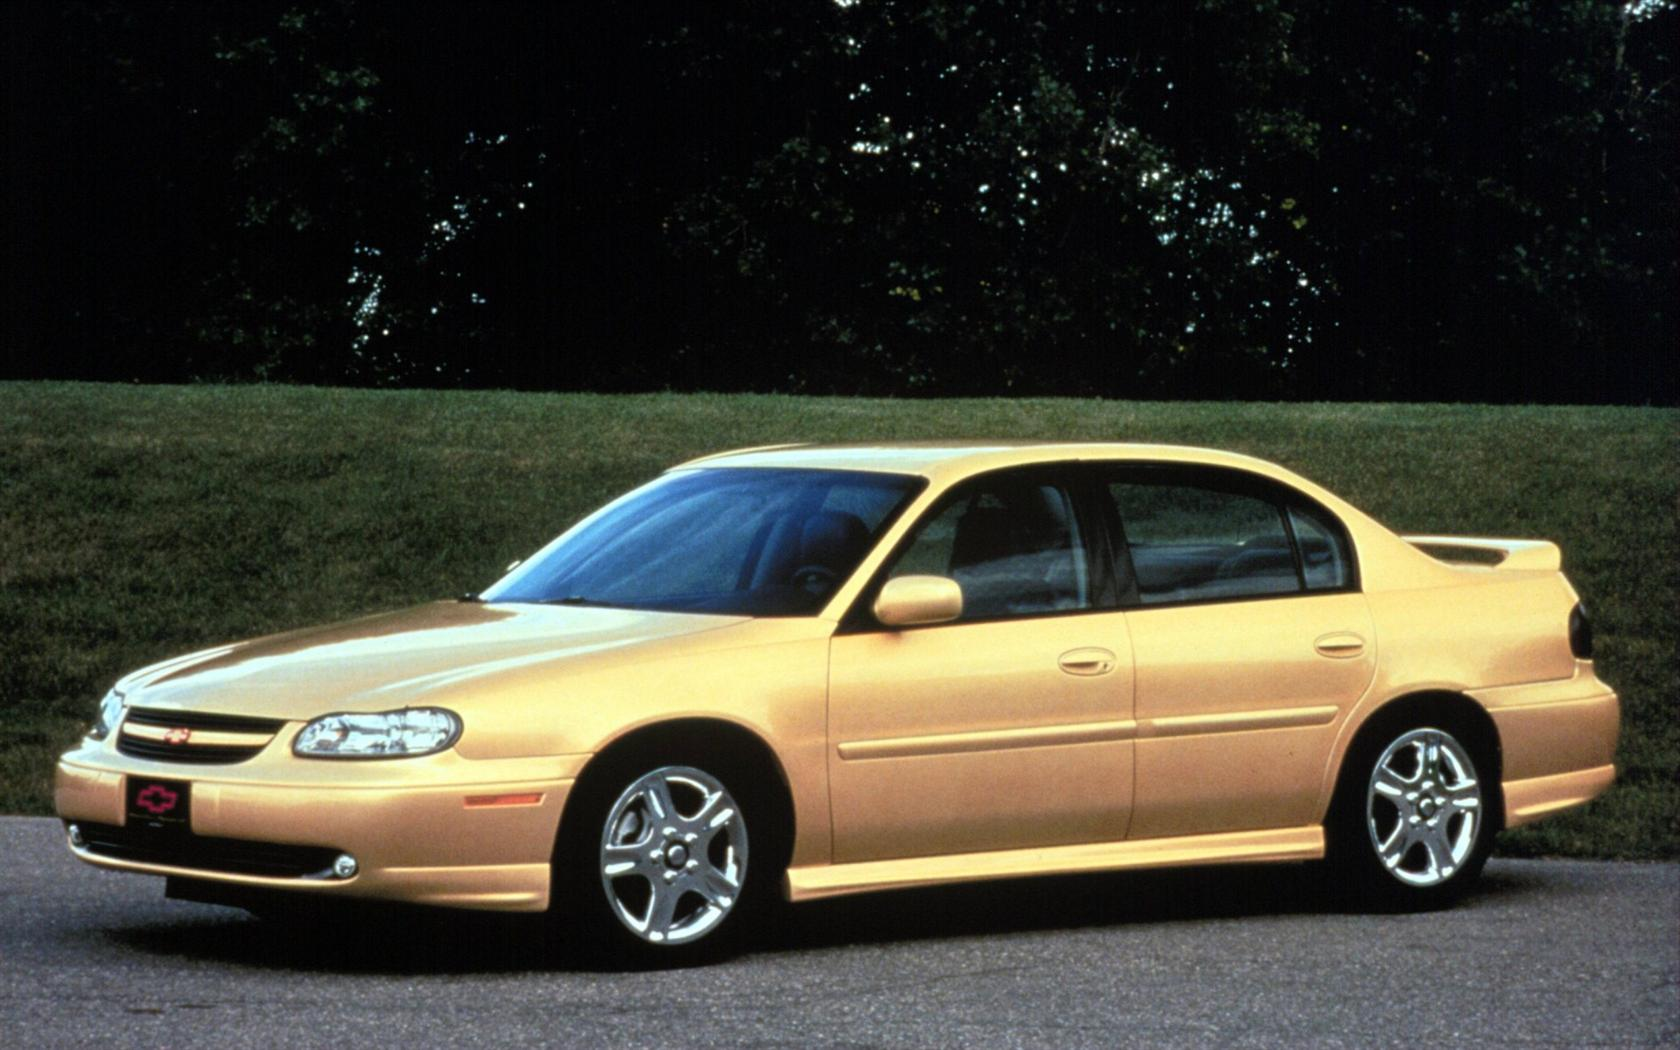 Cavalier 98 chevy cavalier tire size : Cavalier » 1999 Chevy Cavalier Tire Size - Old Chevy Photos ...